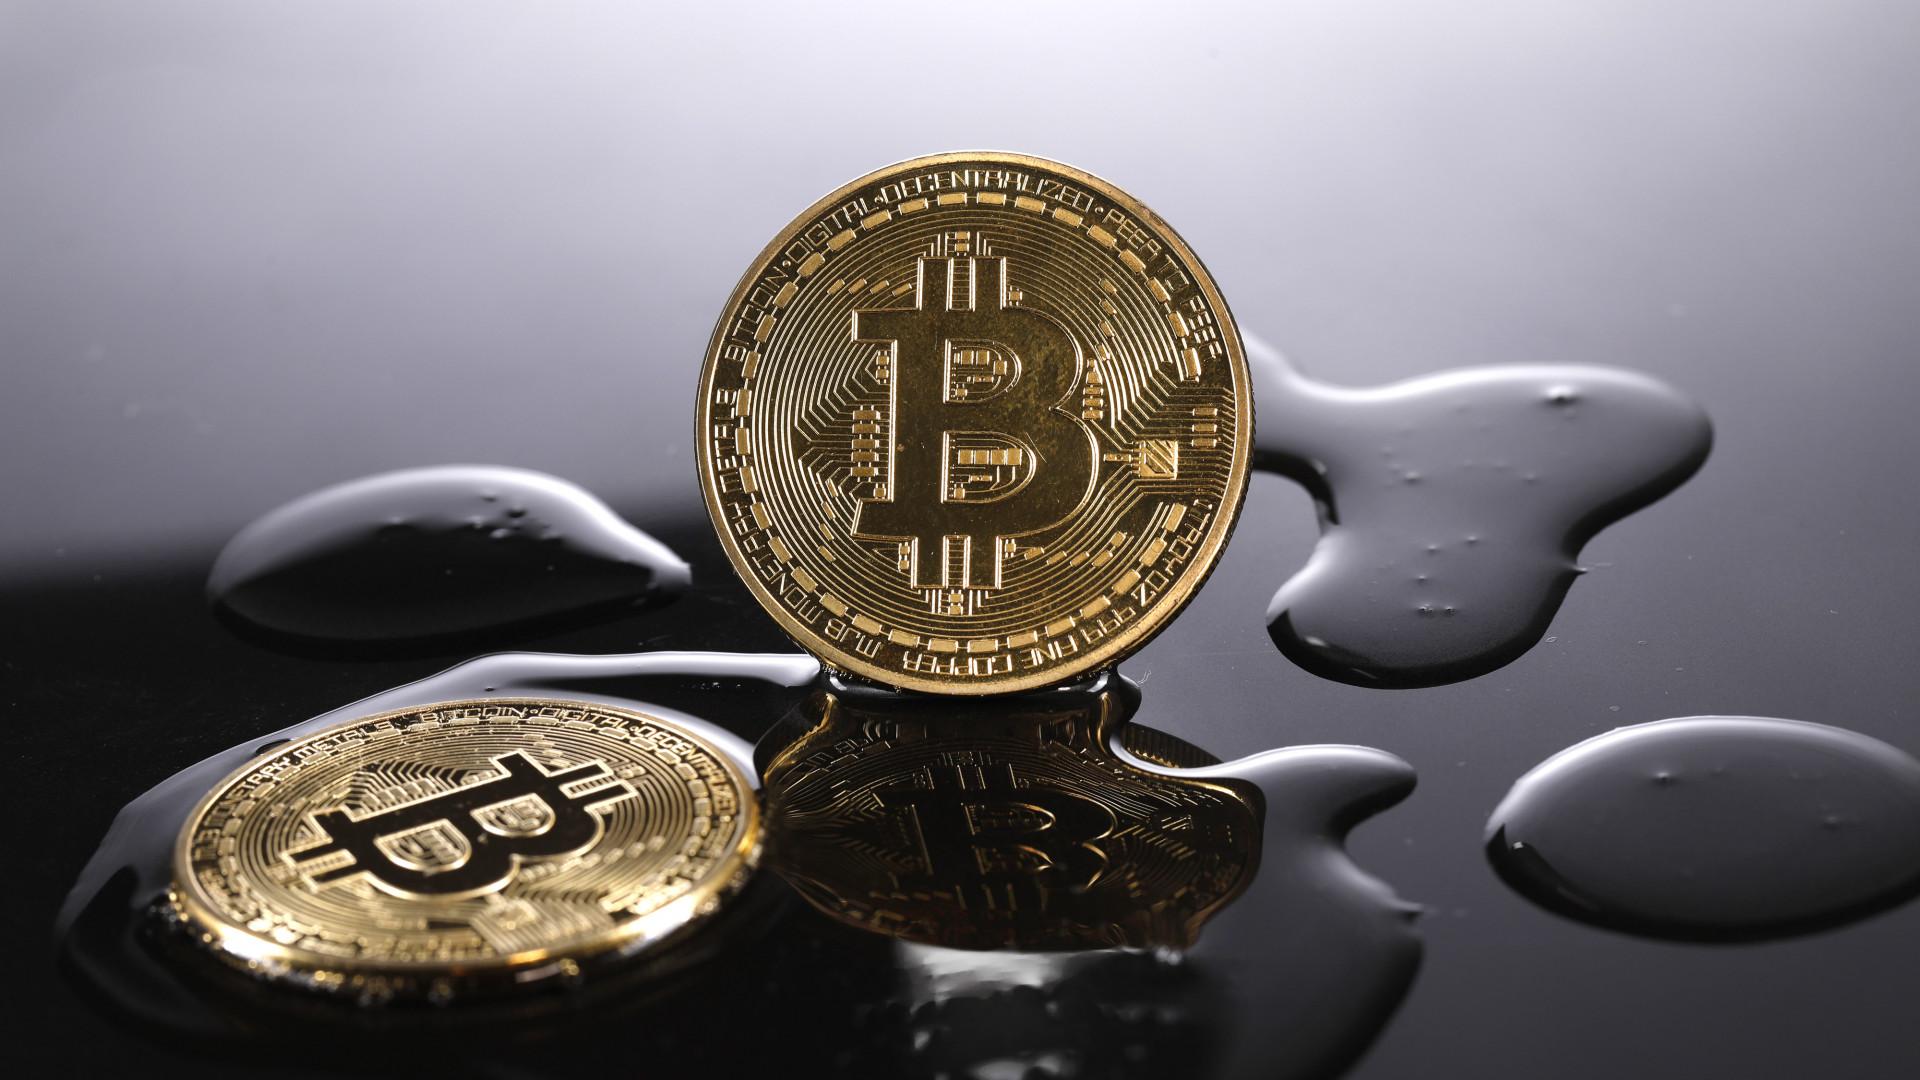 Rekord magas hash rate a Bitcoin rendszerében